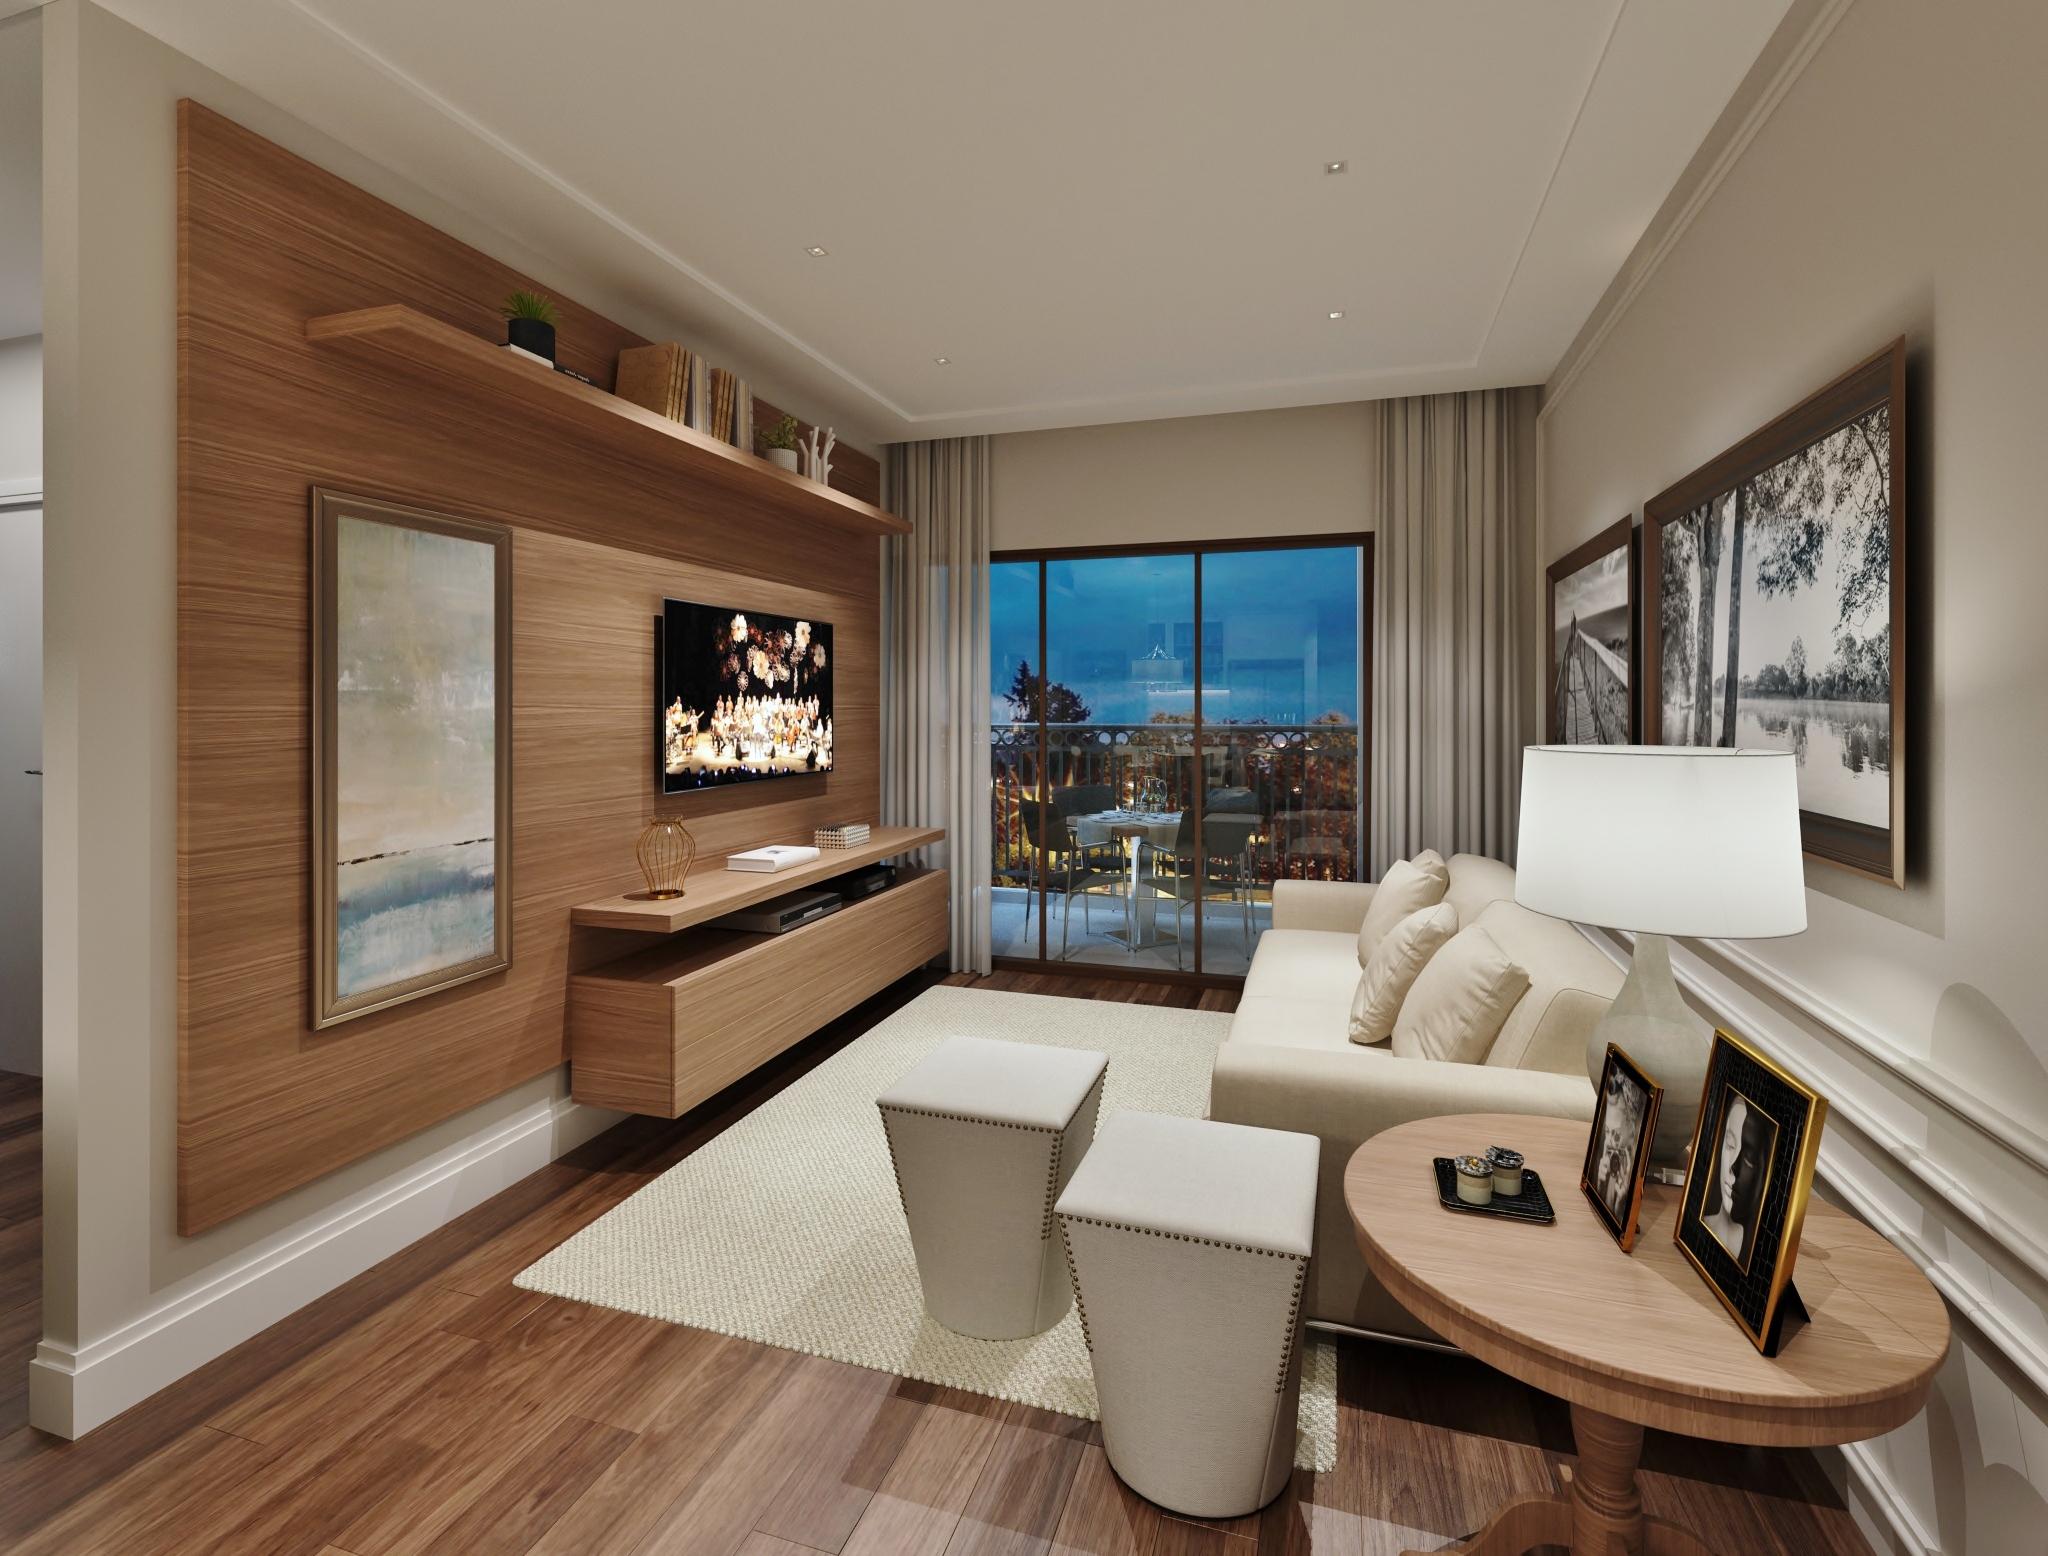 zorzi-engenharia-ideale-uno-living-room-3.jpg